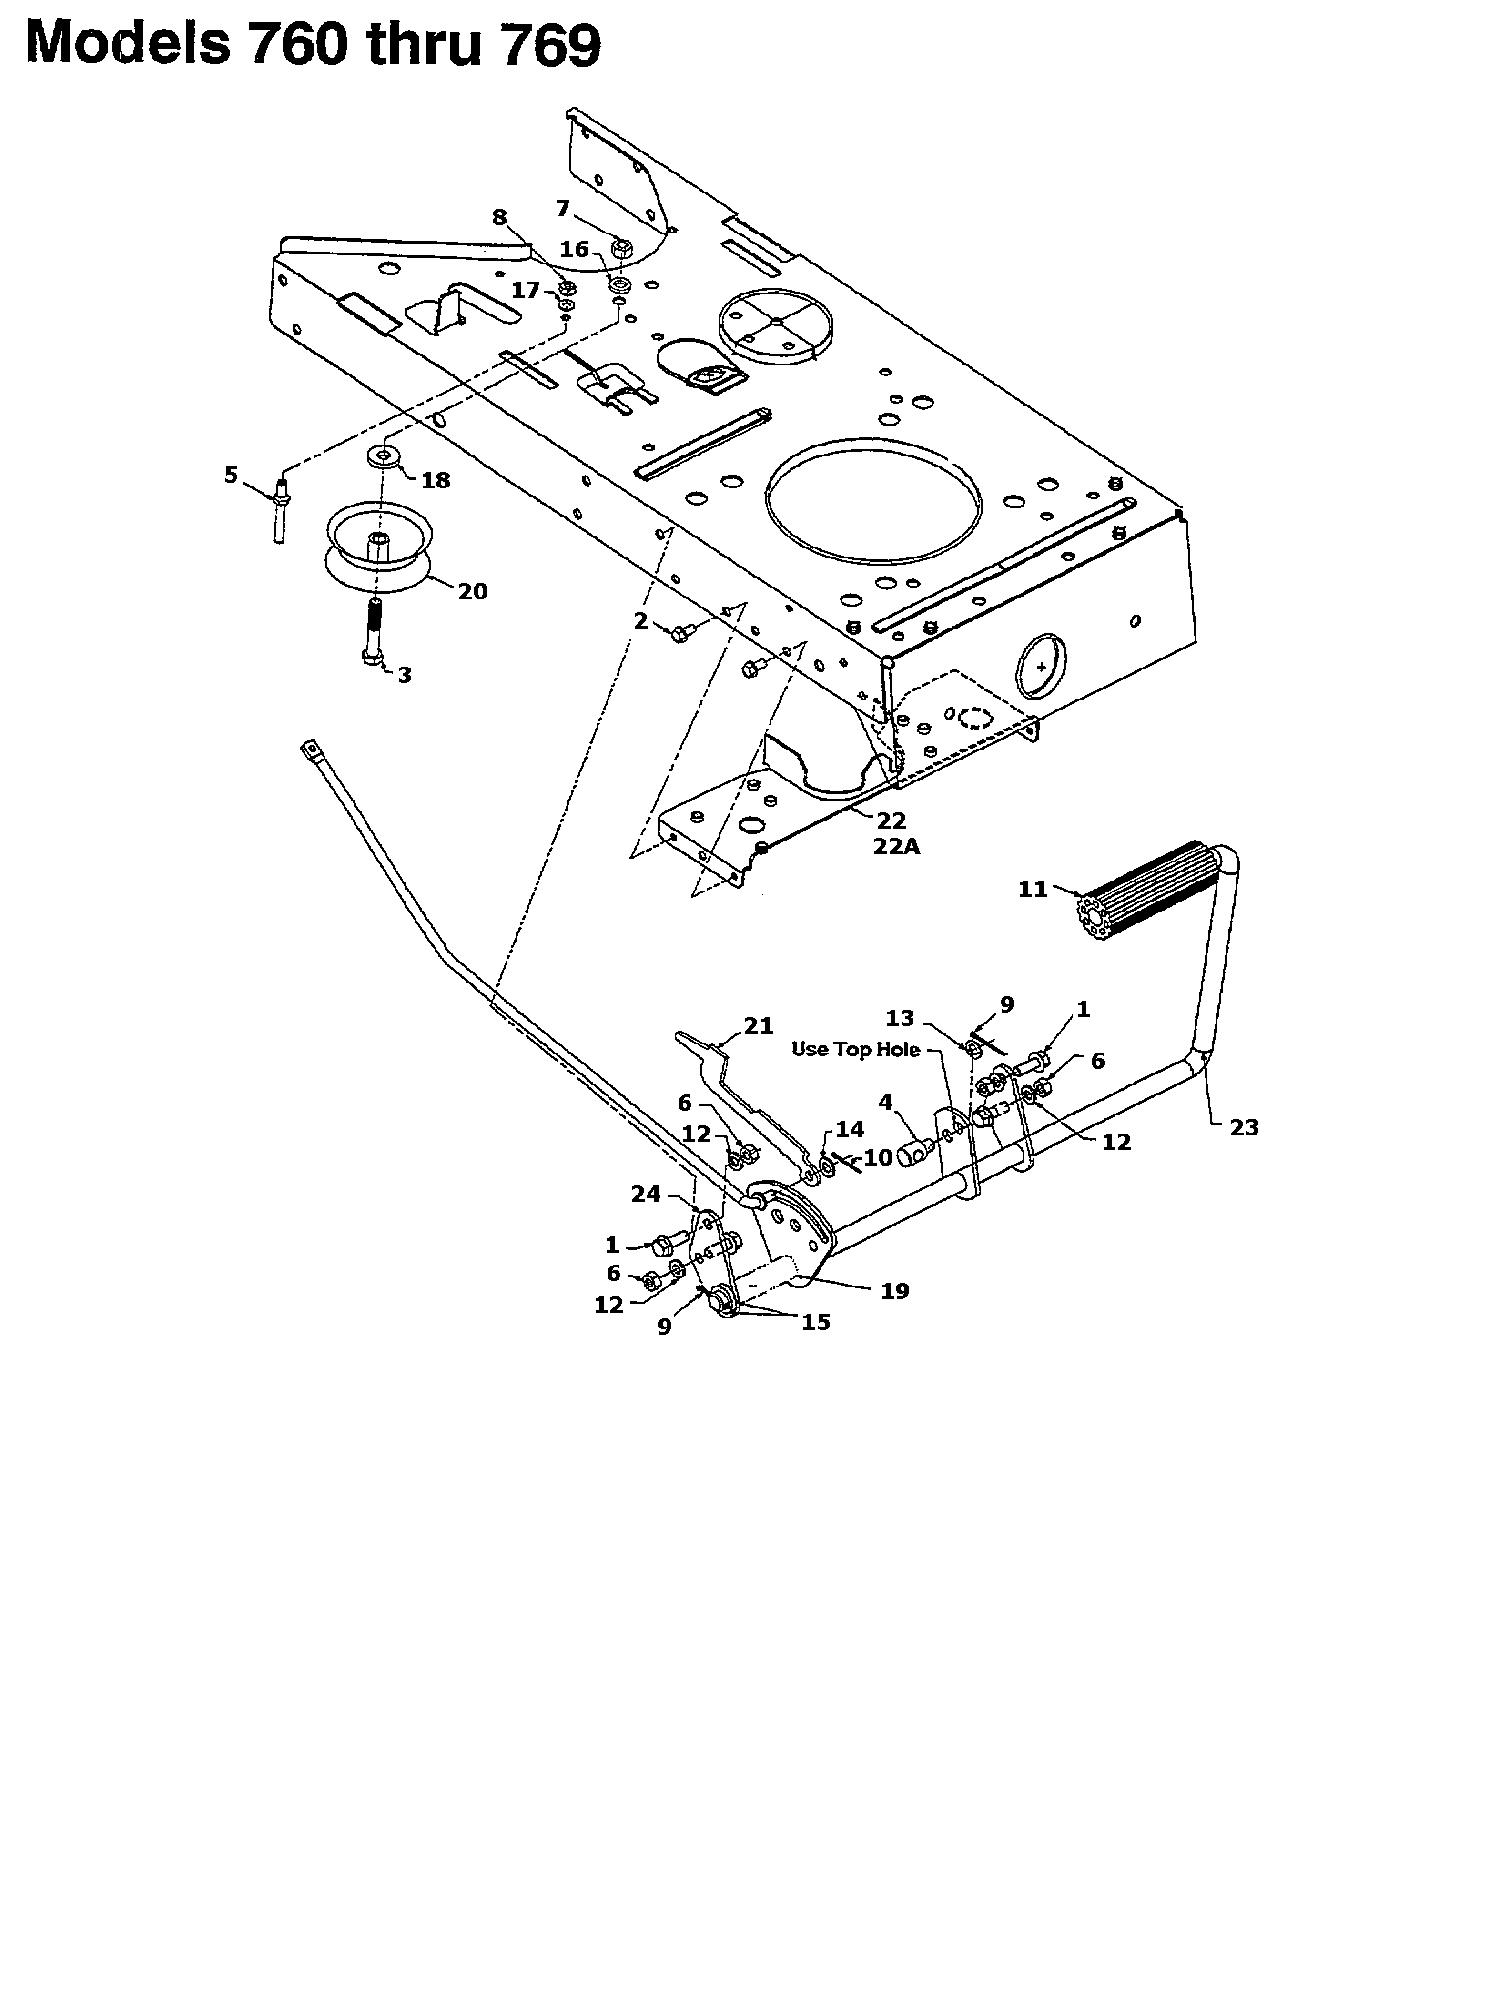 10 Stücke DIP-24 24 Pin Dip Sip Ic Steckdosen Adapter Löten Typ Schmal rp